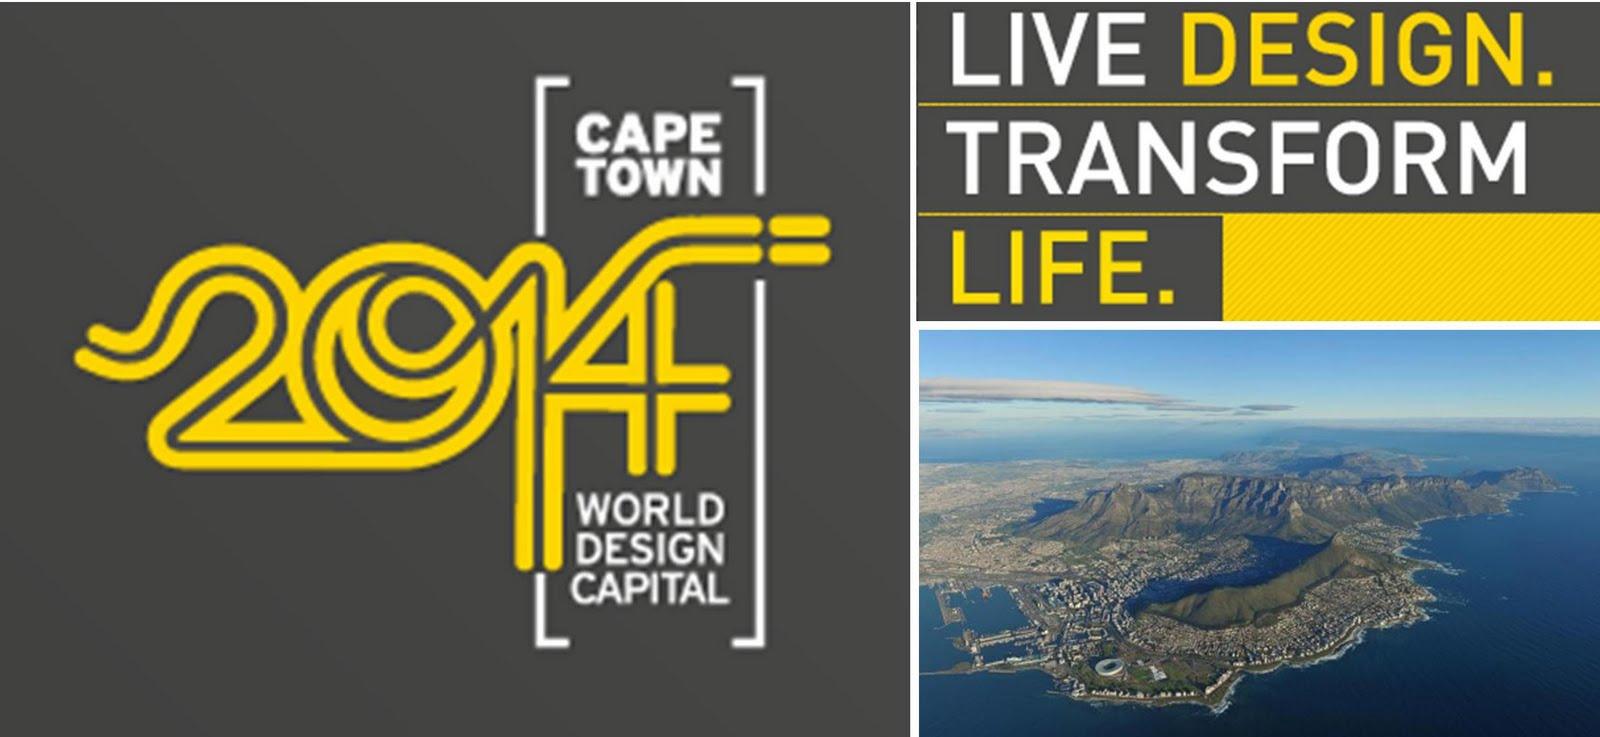 urban ramblings: { cape town for world design capital! }